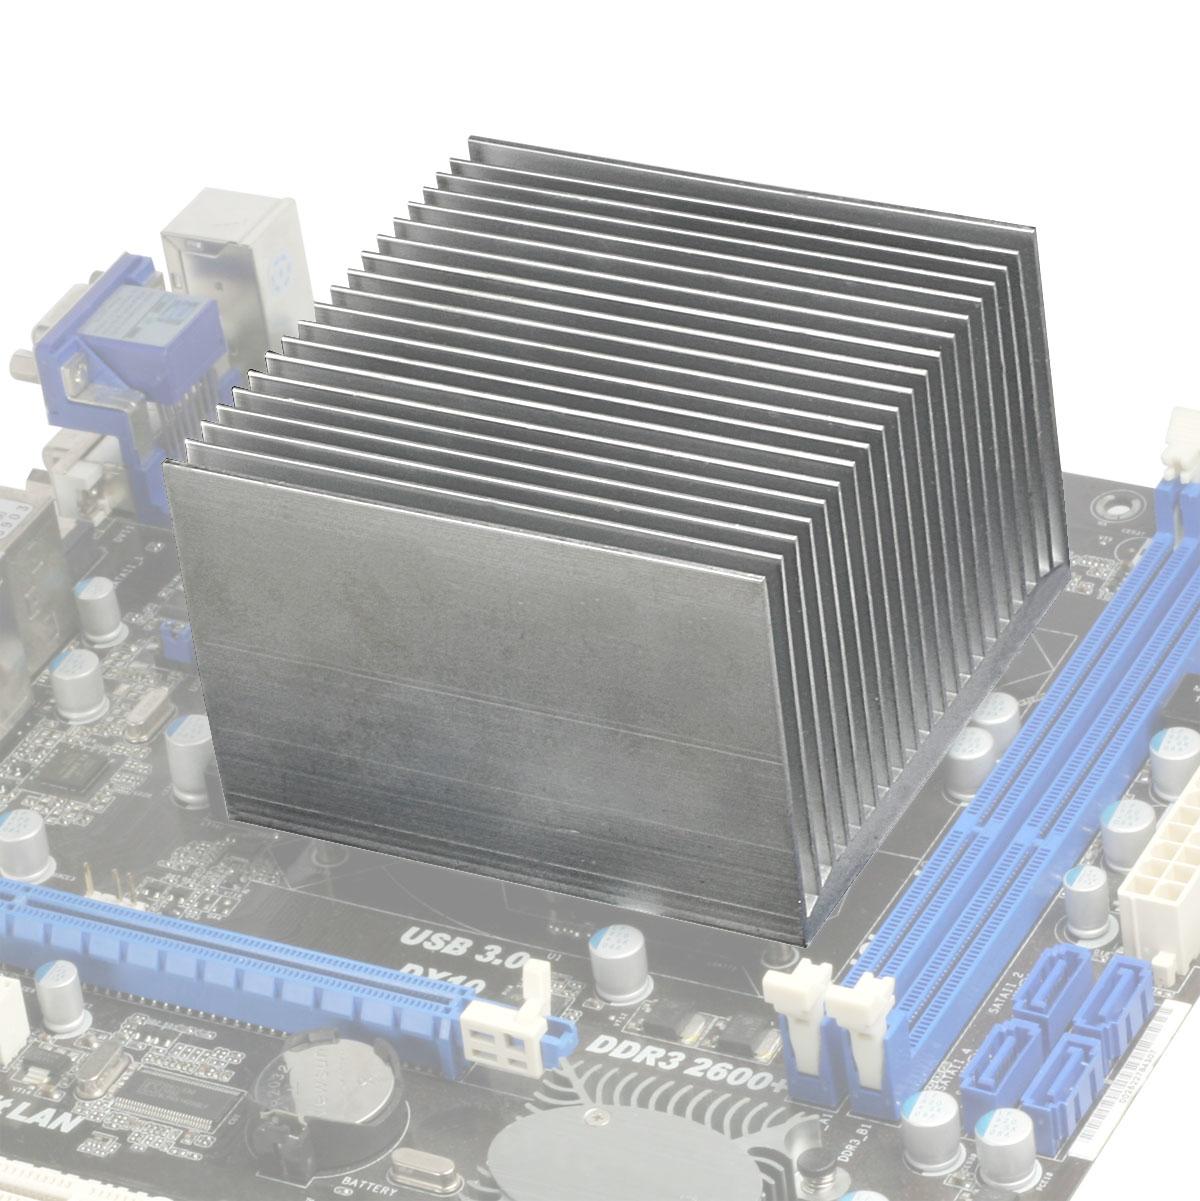 Alpine 11 - Passive Geräuschloser Intel CPU Kühler